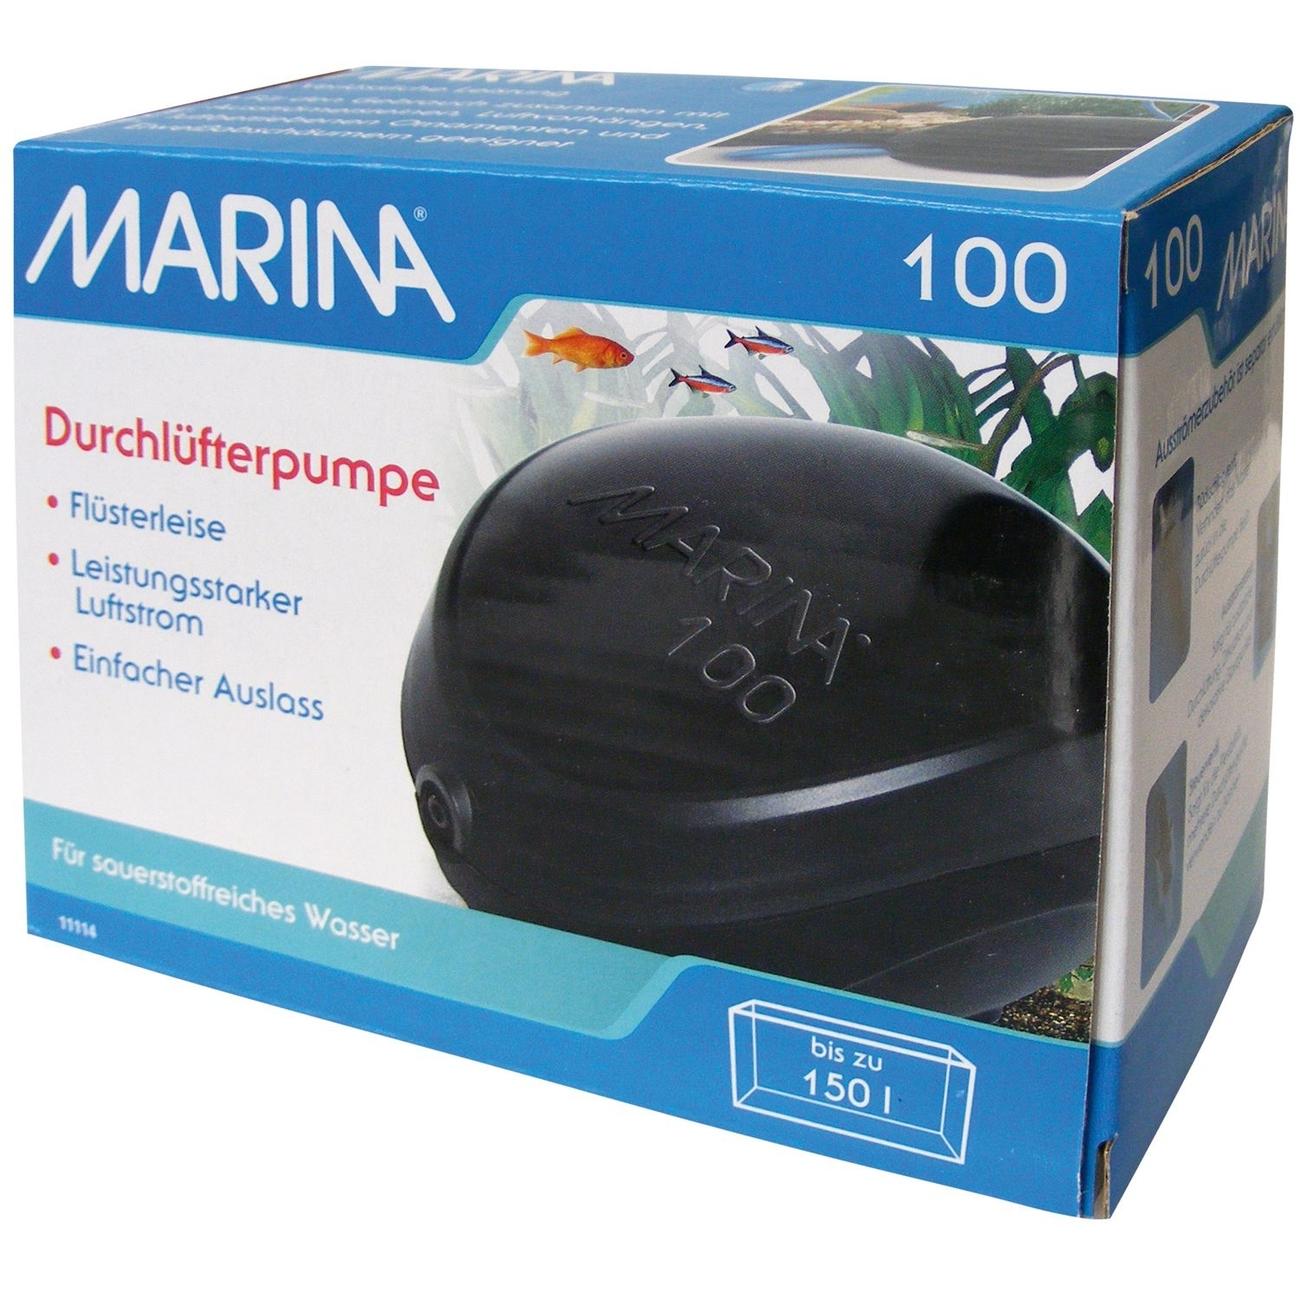 Hagen Marina Durchlüfterpumpe, 100 (8,4 x 6,5 x 11,5 cm)